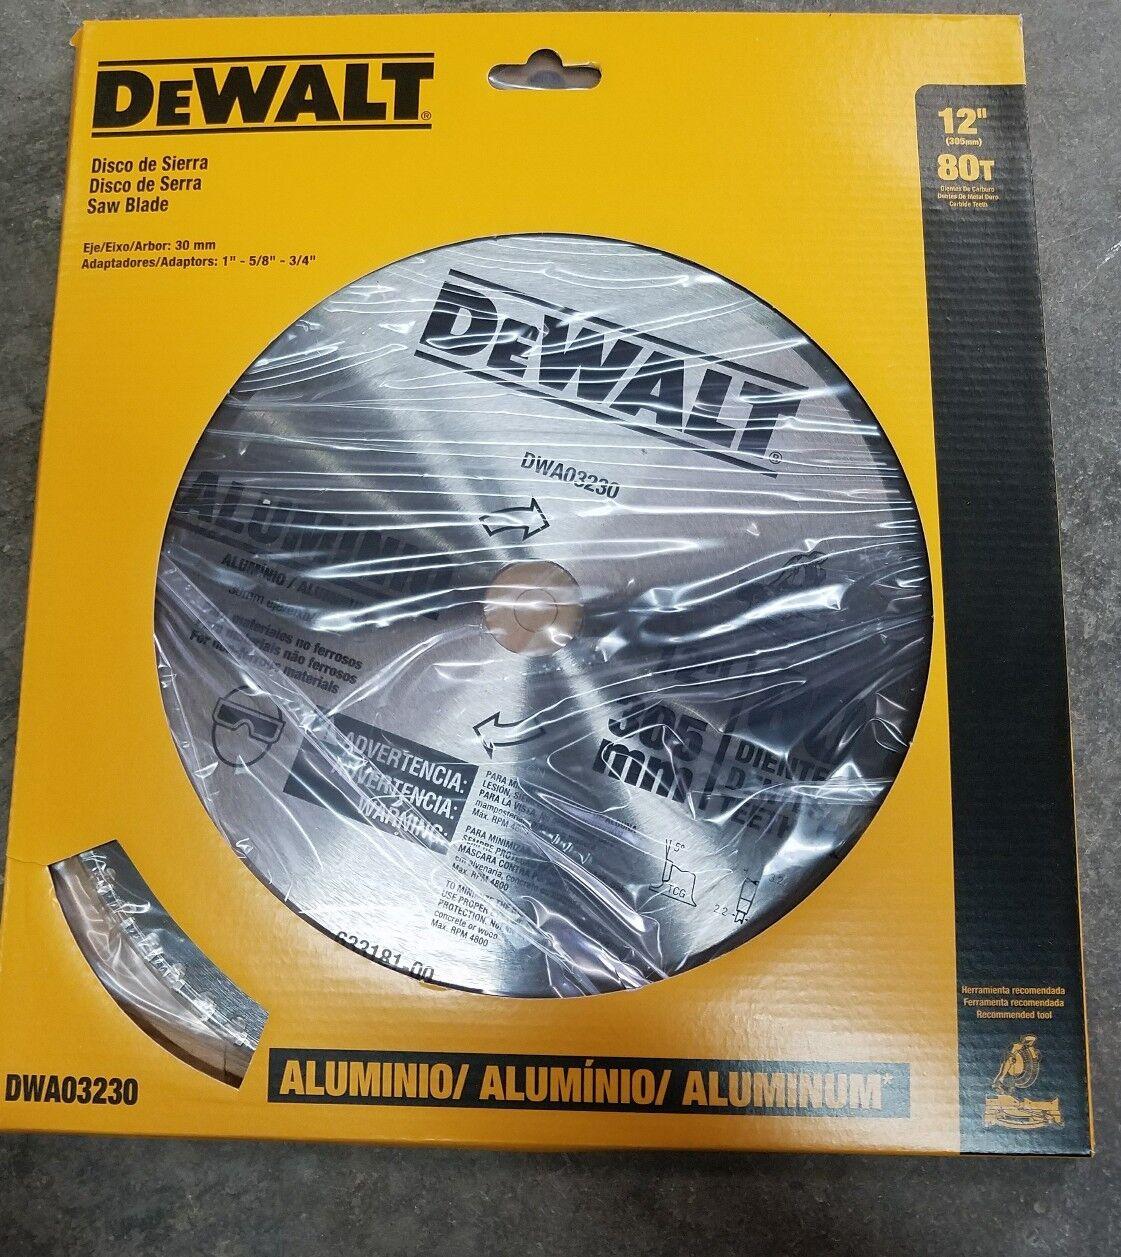 Dewalt DWA03230 Sägeblatt 30.5cm 80 Zähne Aluminum